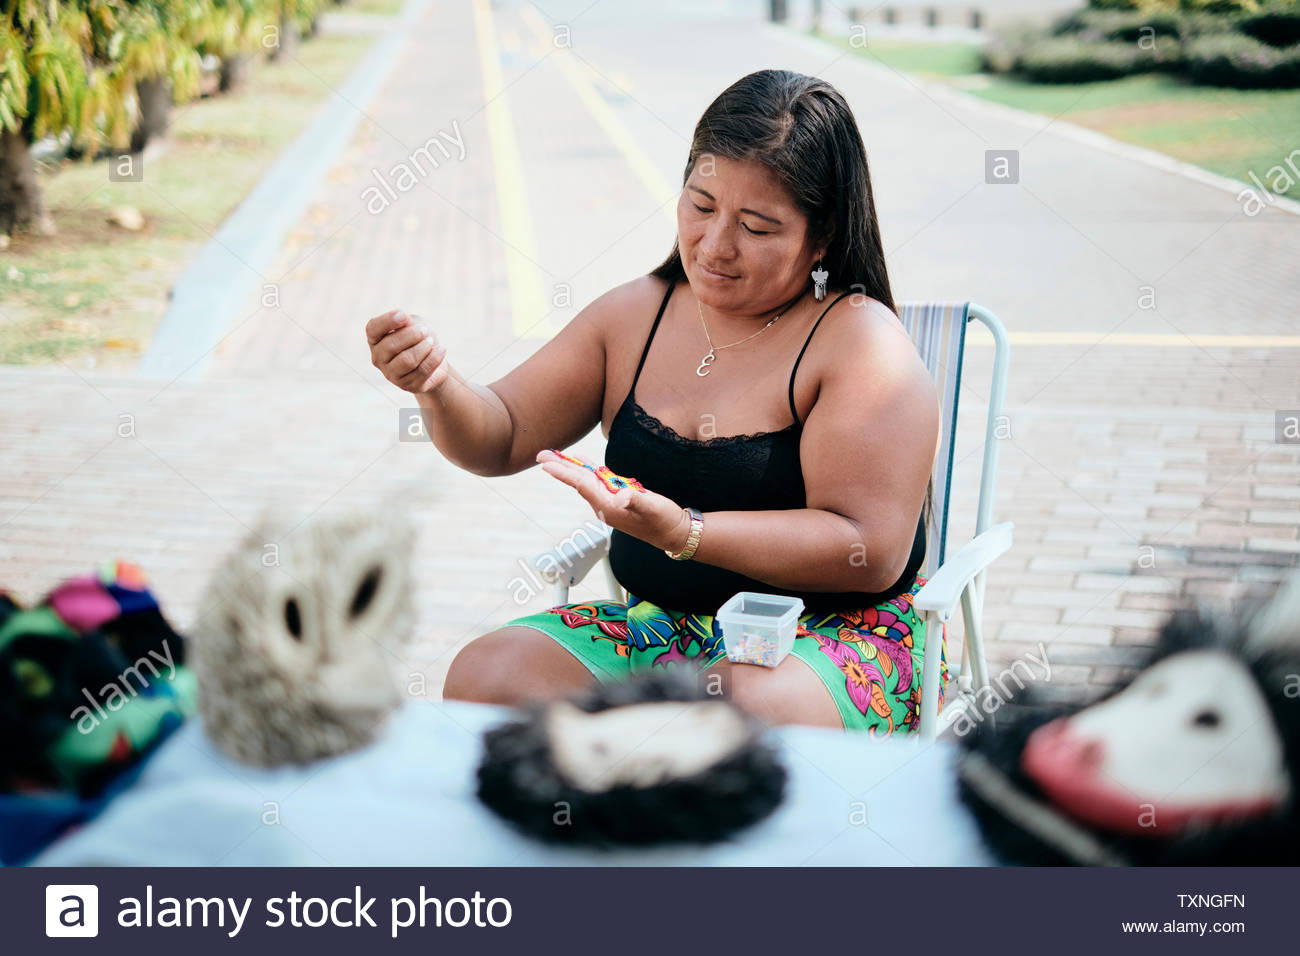 Indigenous woman beading flower coaster at stall, Ciudad de Panamá, Panama - Stock Image